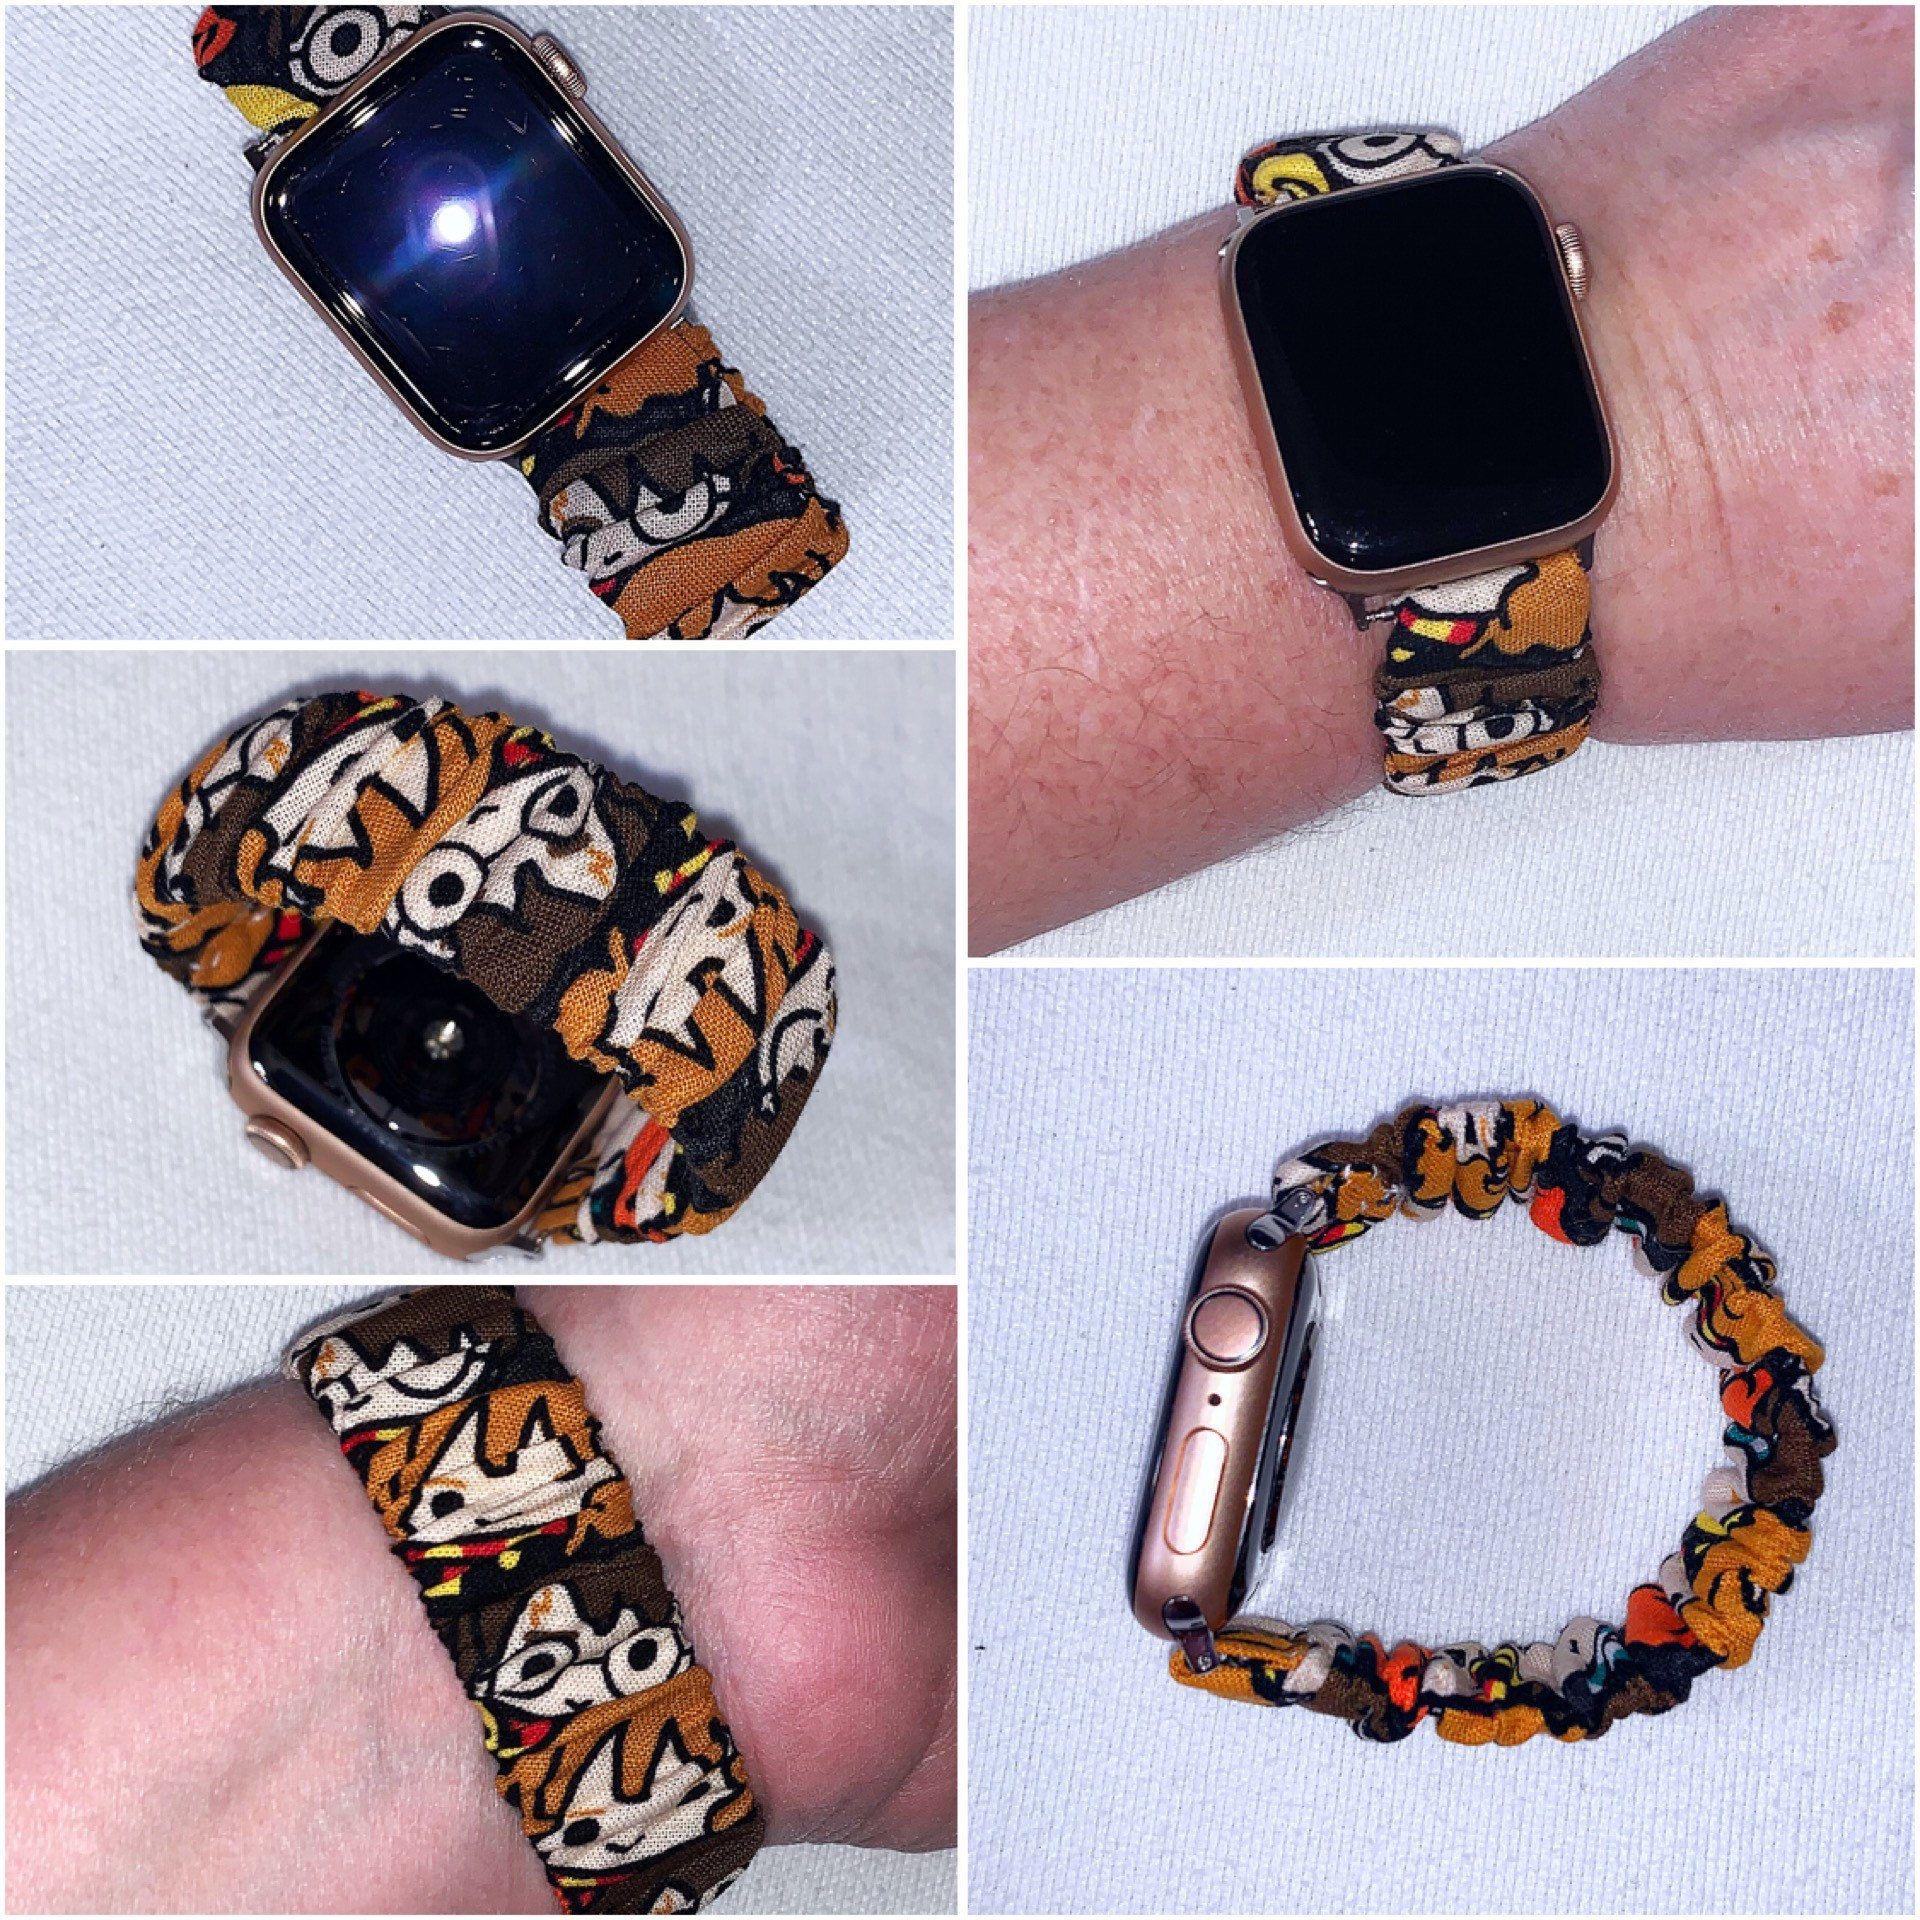 Harry Potter Apple Watch Fabric Bracelet Watch Band 38 40 42 44mm Series 1 2 3 4 5 Smart Watch Fabric Snap Closure Strap Hermione In 2020 Watch Bands Fabric Bracelets Beaded Leather Bracelet